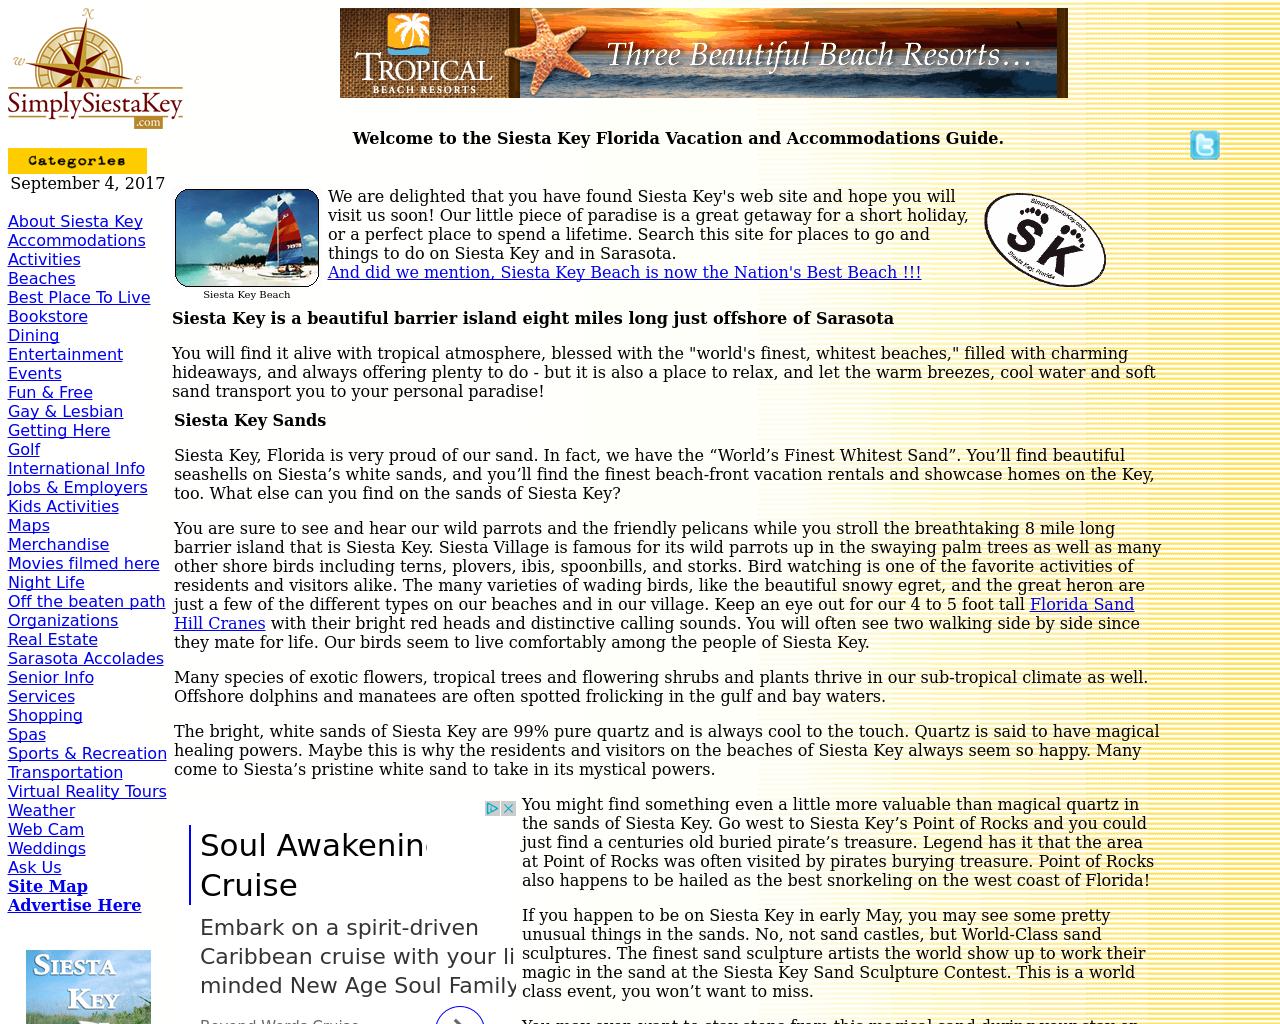 Simply-Siesta-Key-Advertising-Reviews-Pricing